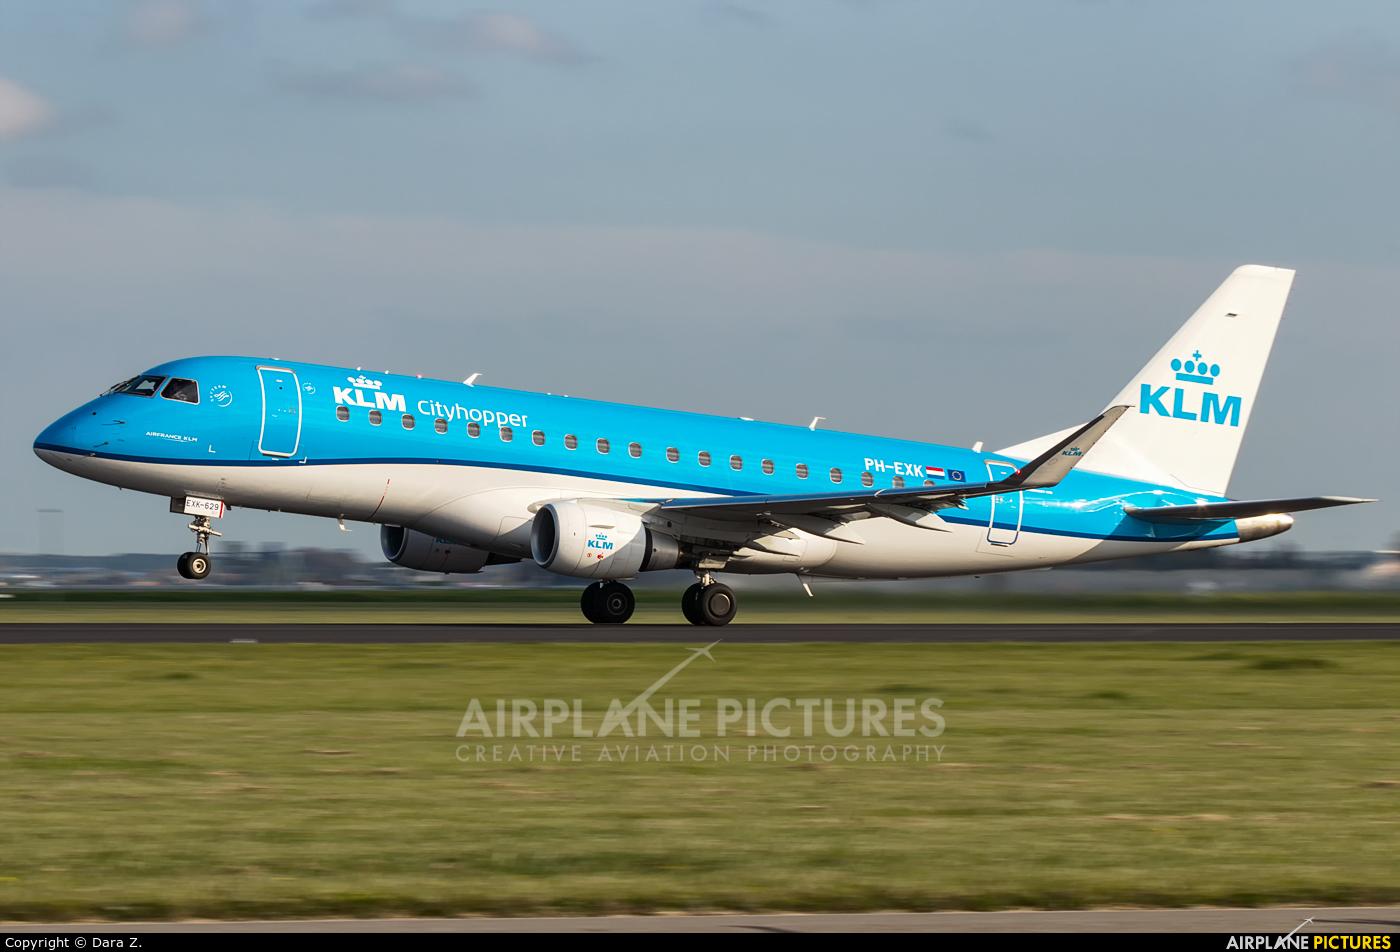 KLM Cityhopper PH-EXK aircraft at Amsterdam - Schiphol